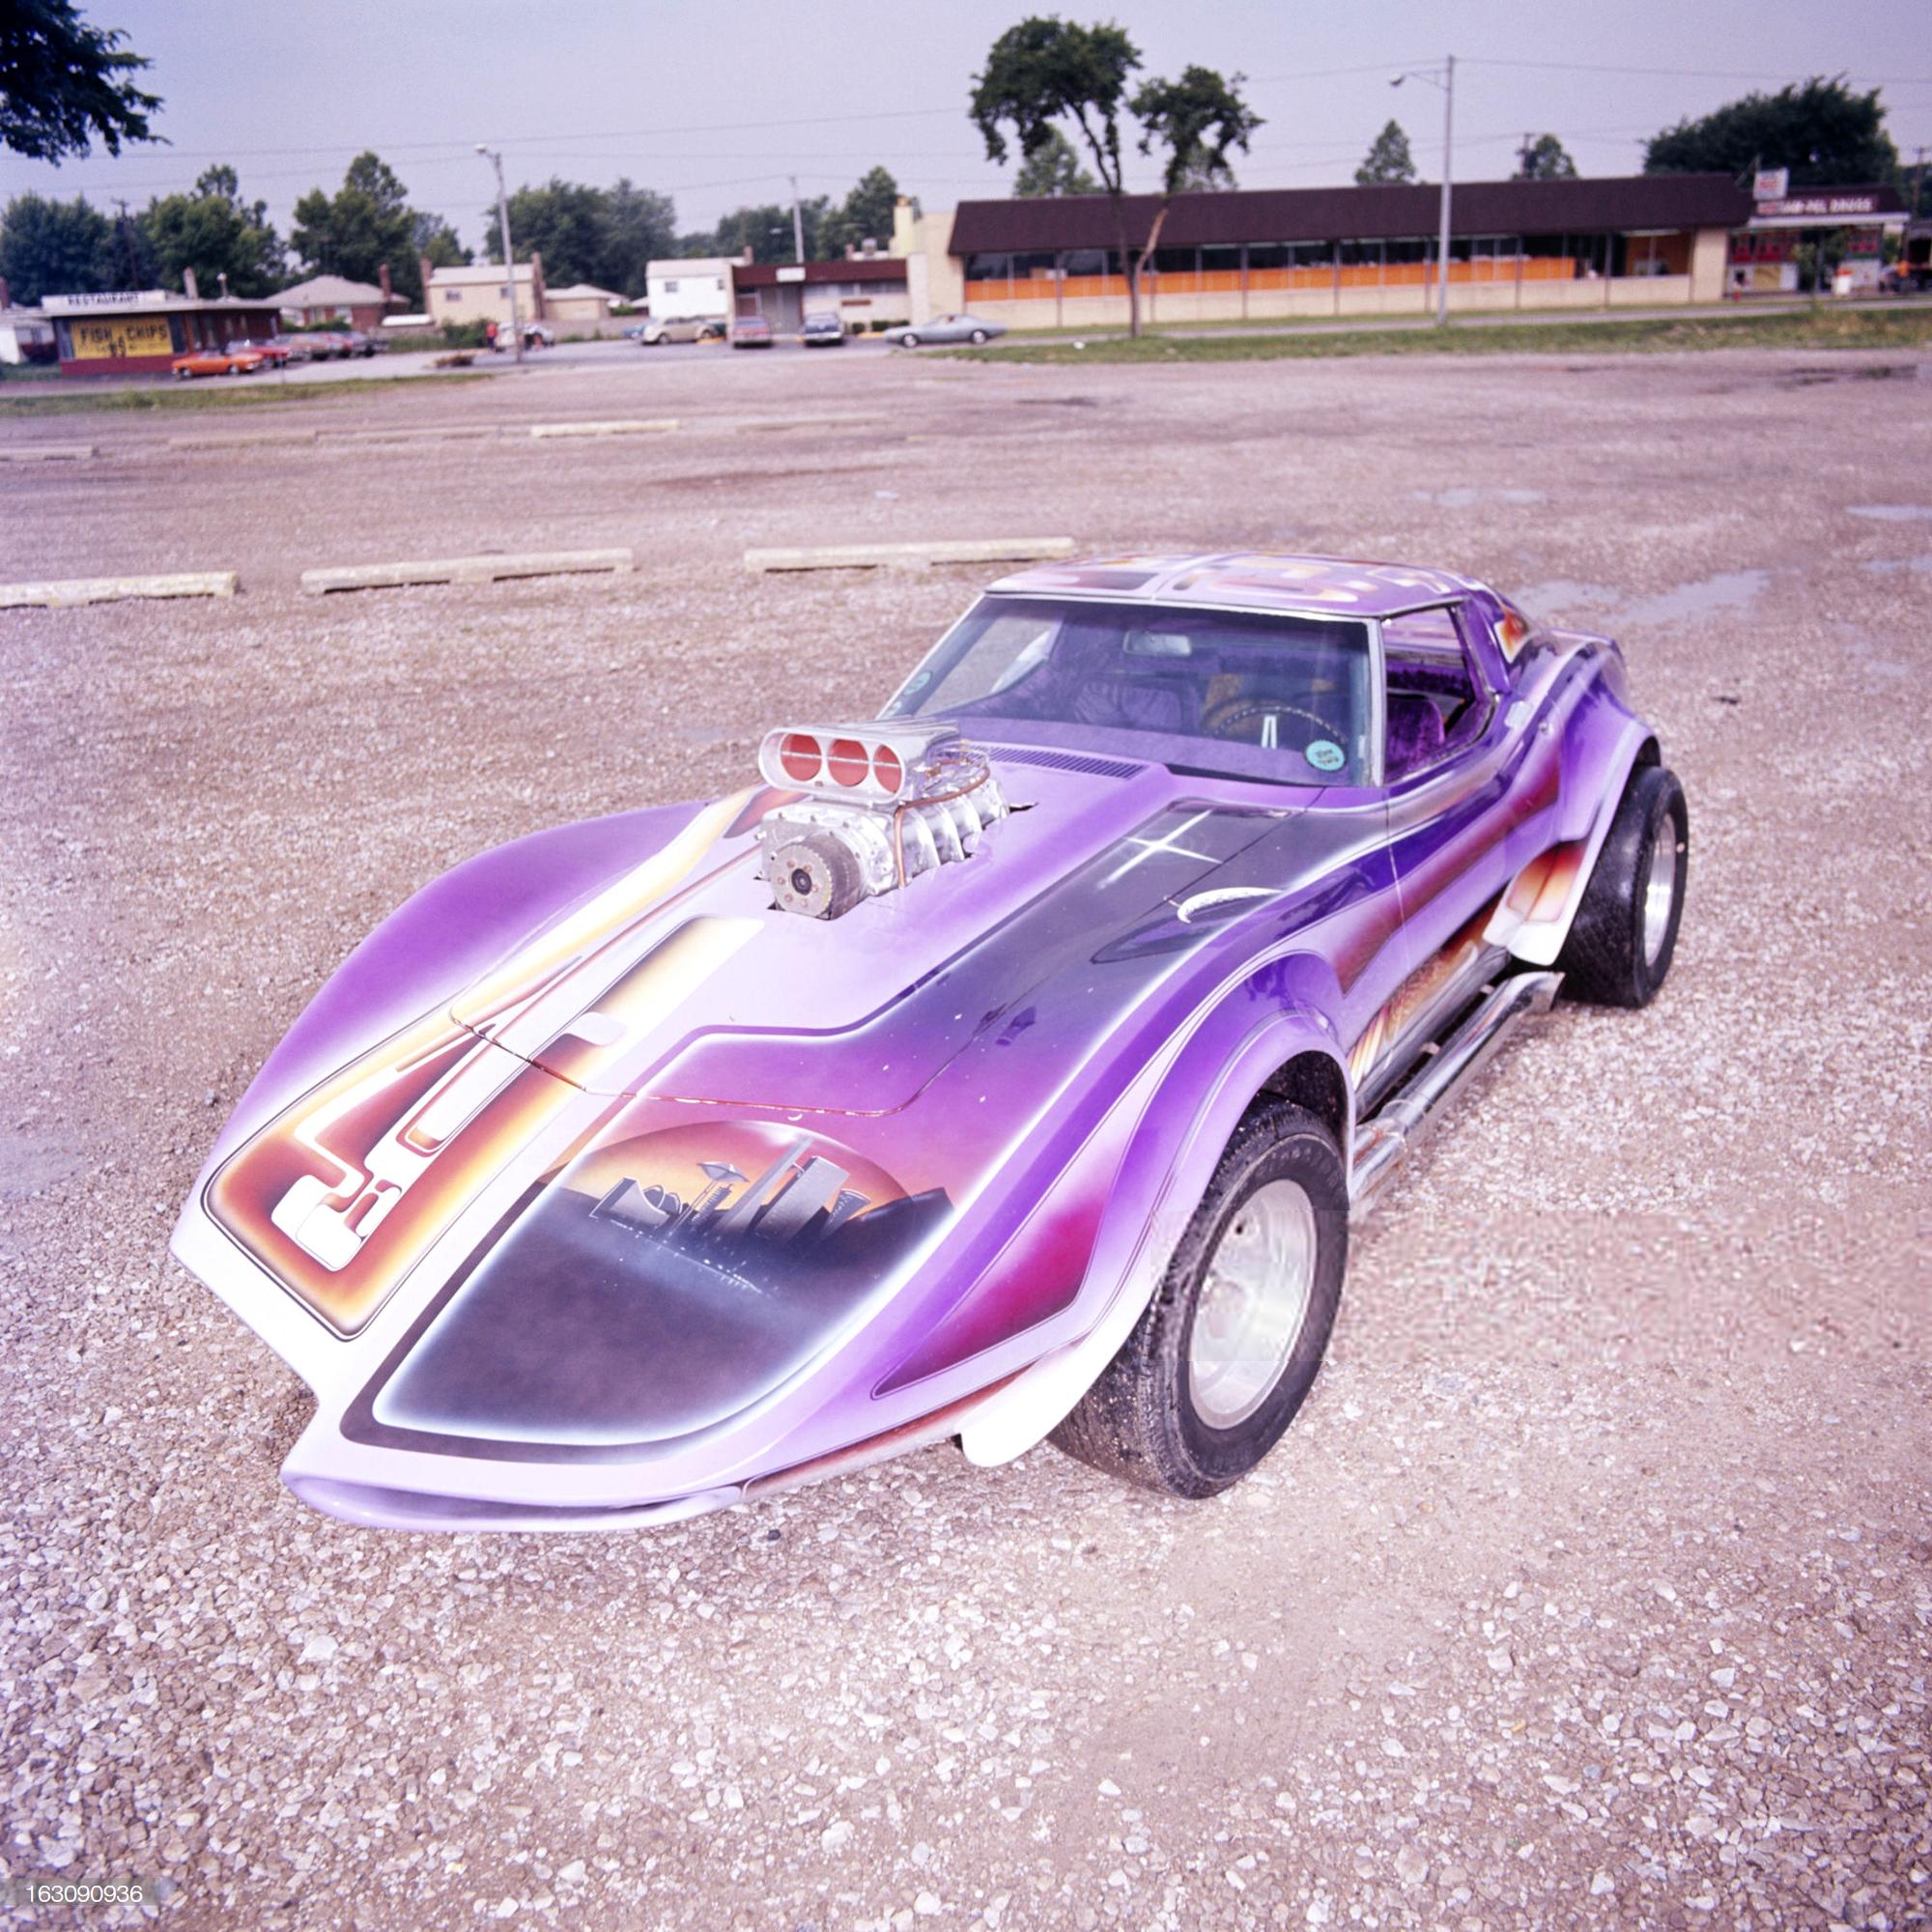 Rick Todd's Corvette, photo 1.